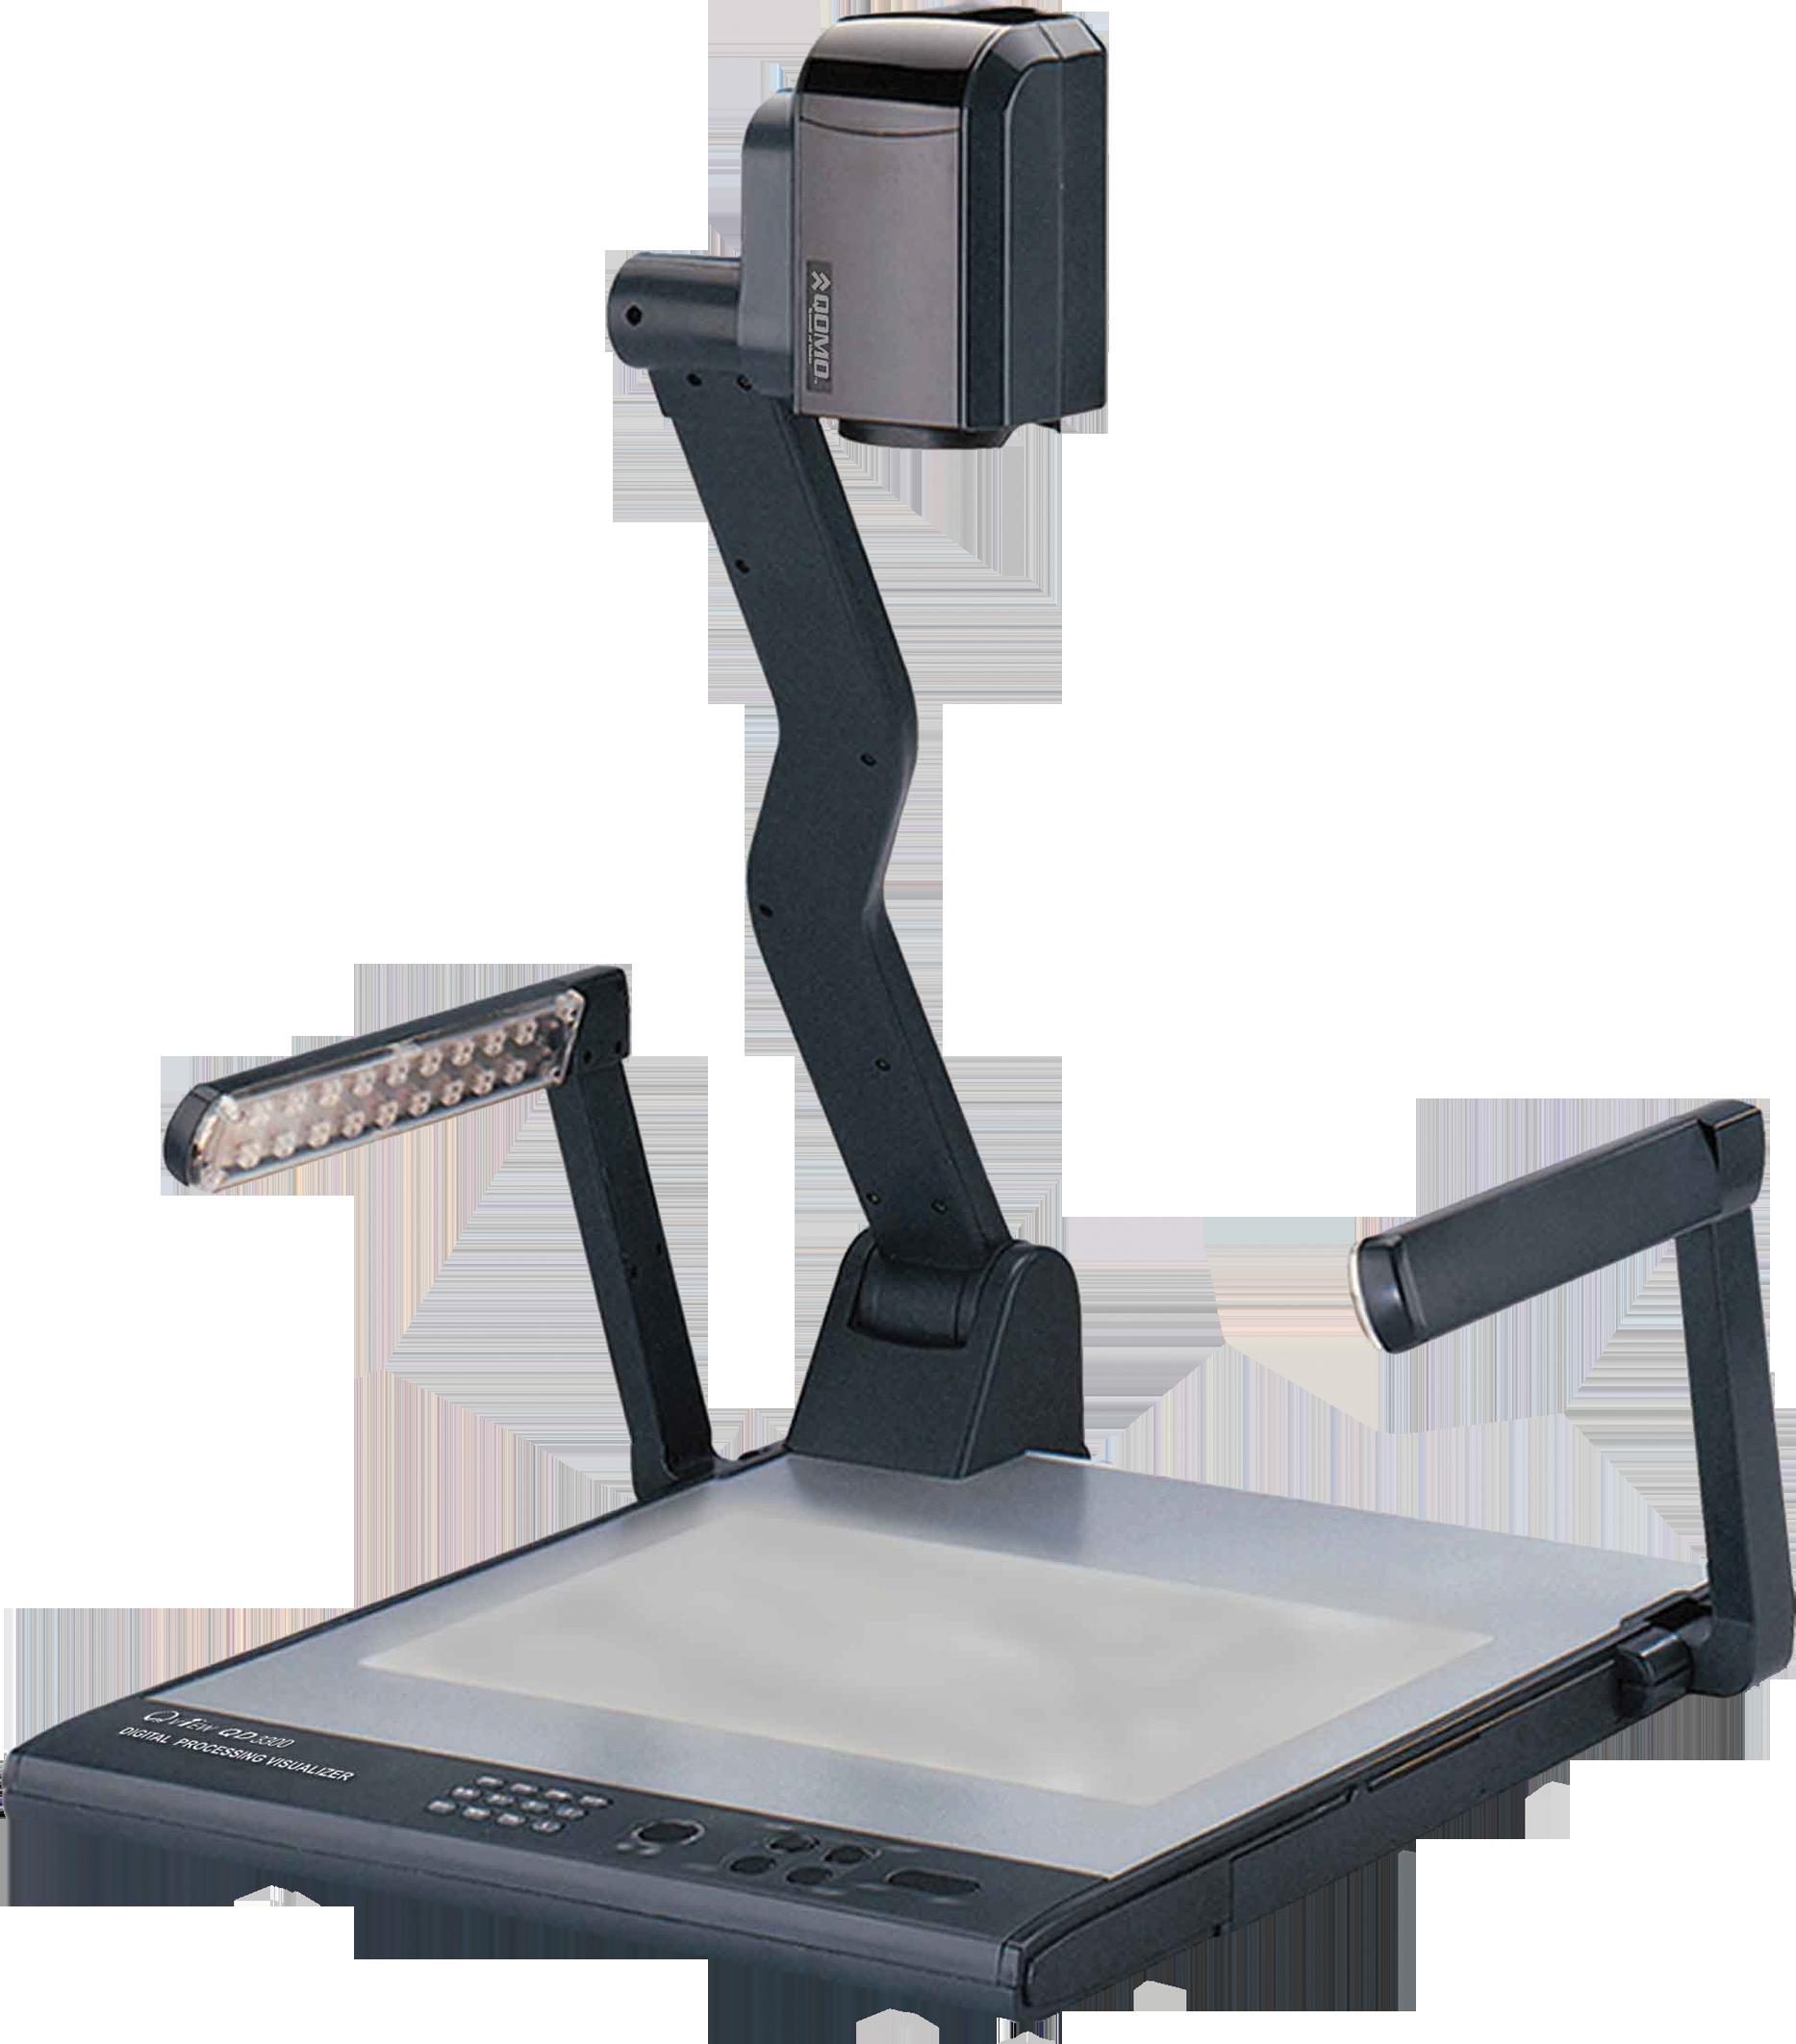 QD3300 Document Camera.